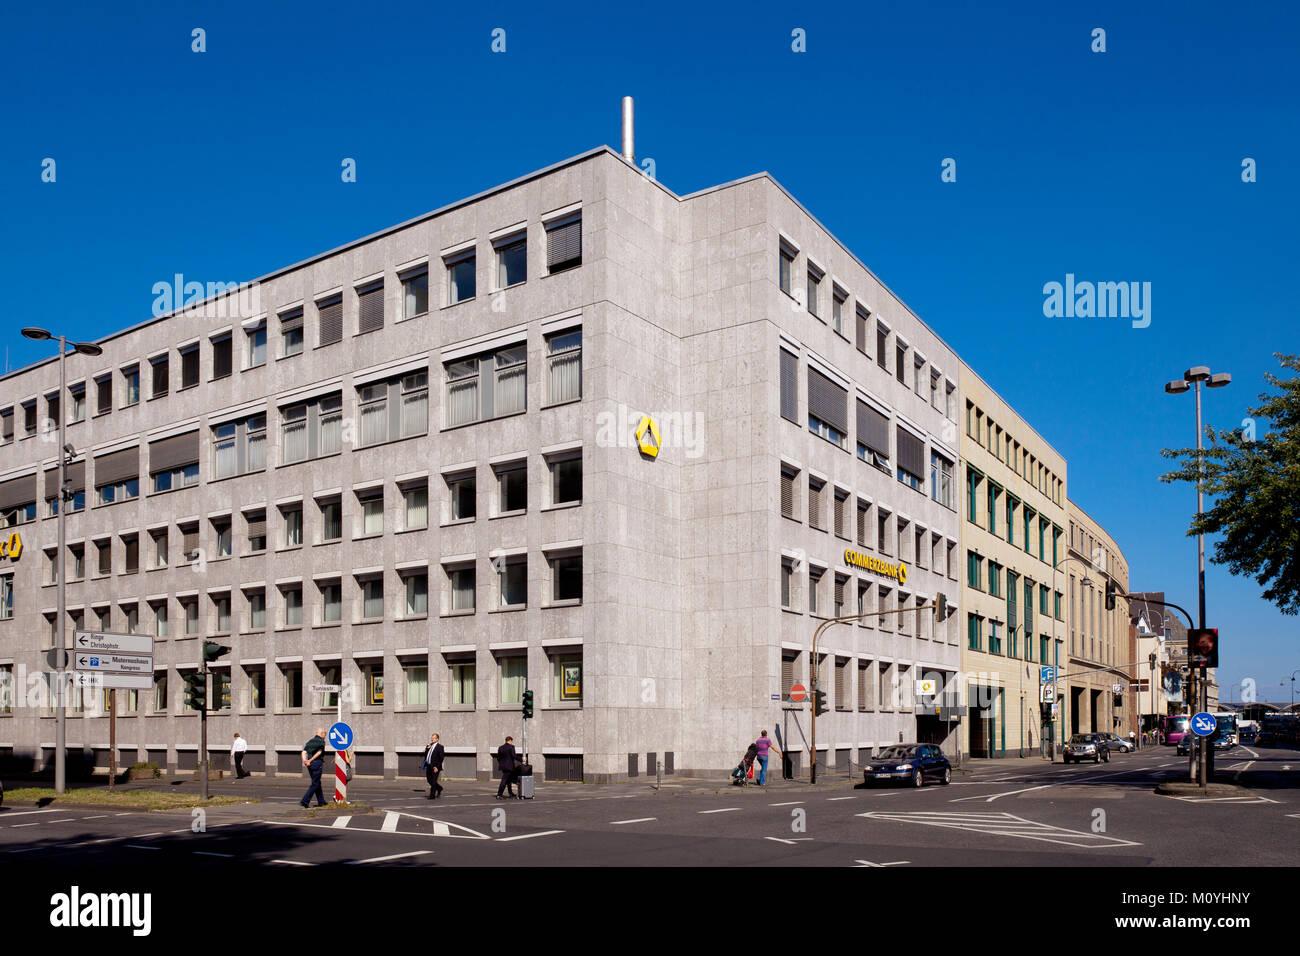 Commerzbank Köln Innenstadt